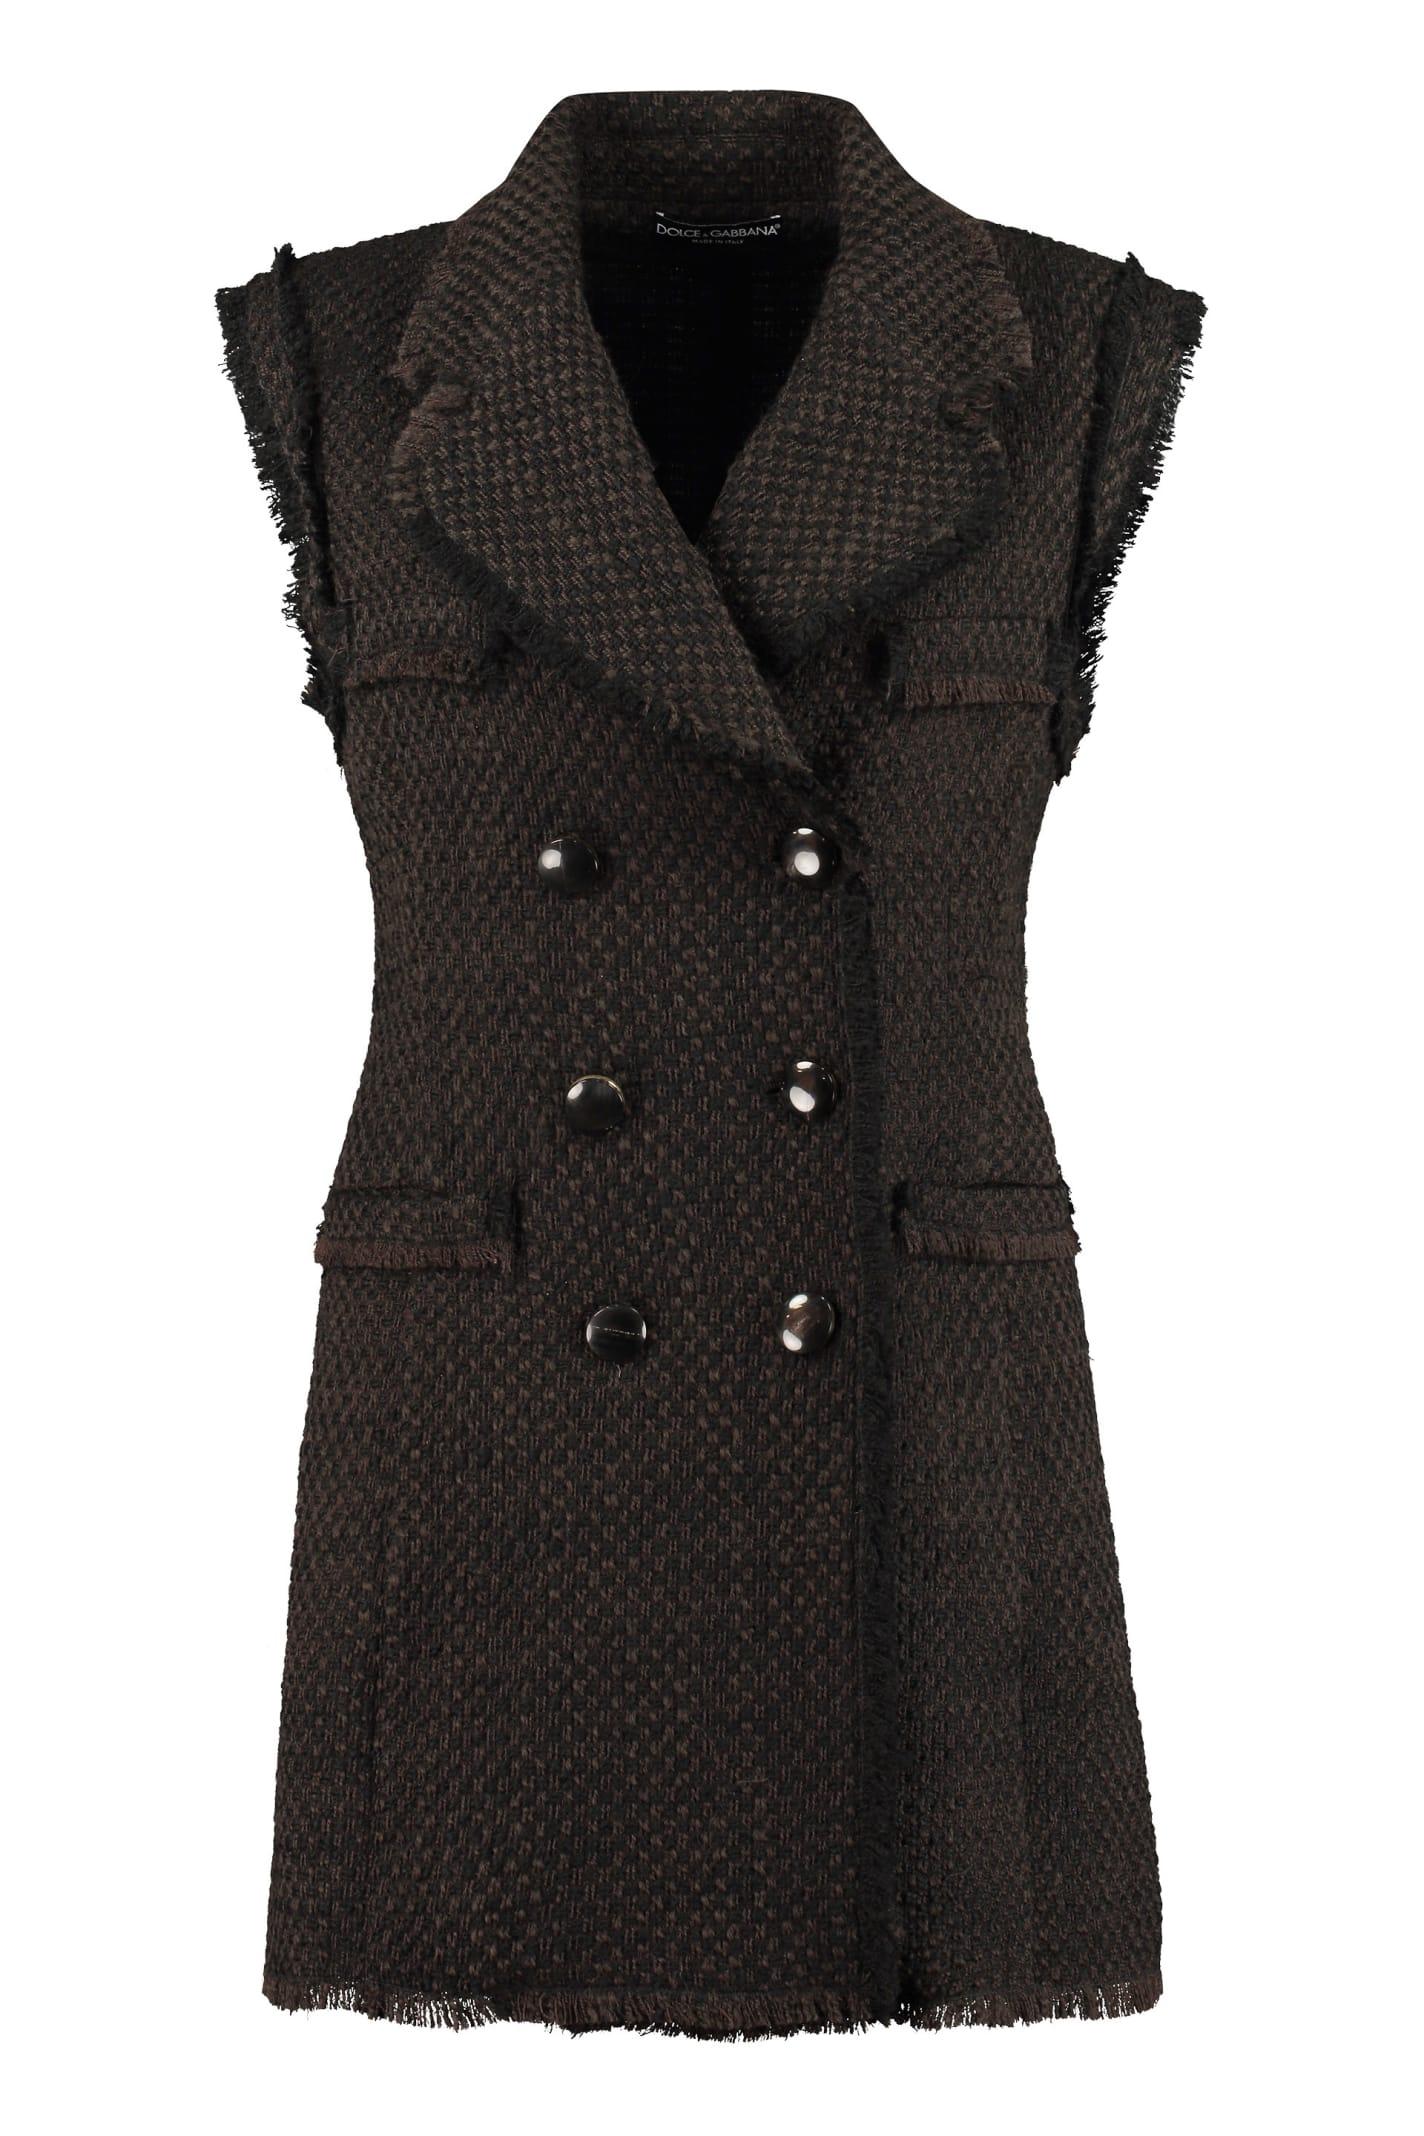 Dolce & Gabbana Wool Blend Waistcoat